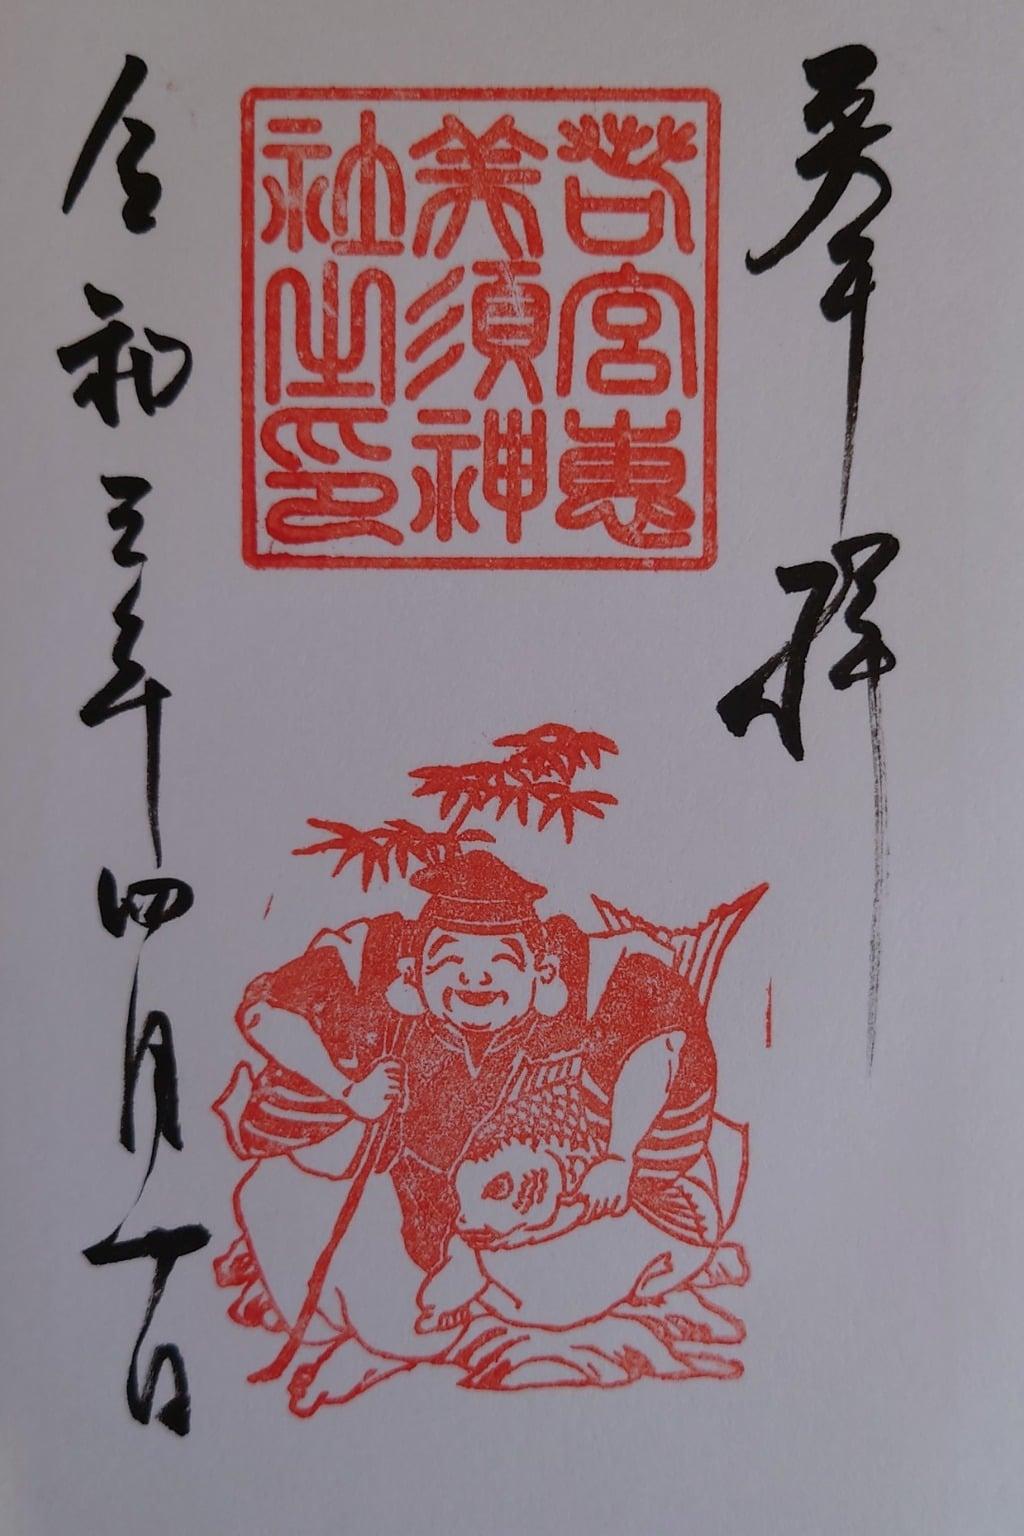 若宮八幡社の御朱印